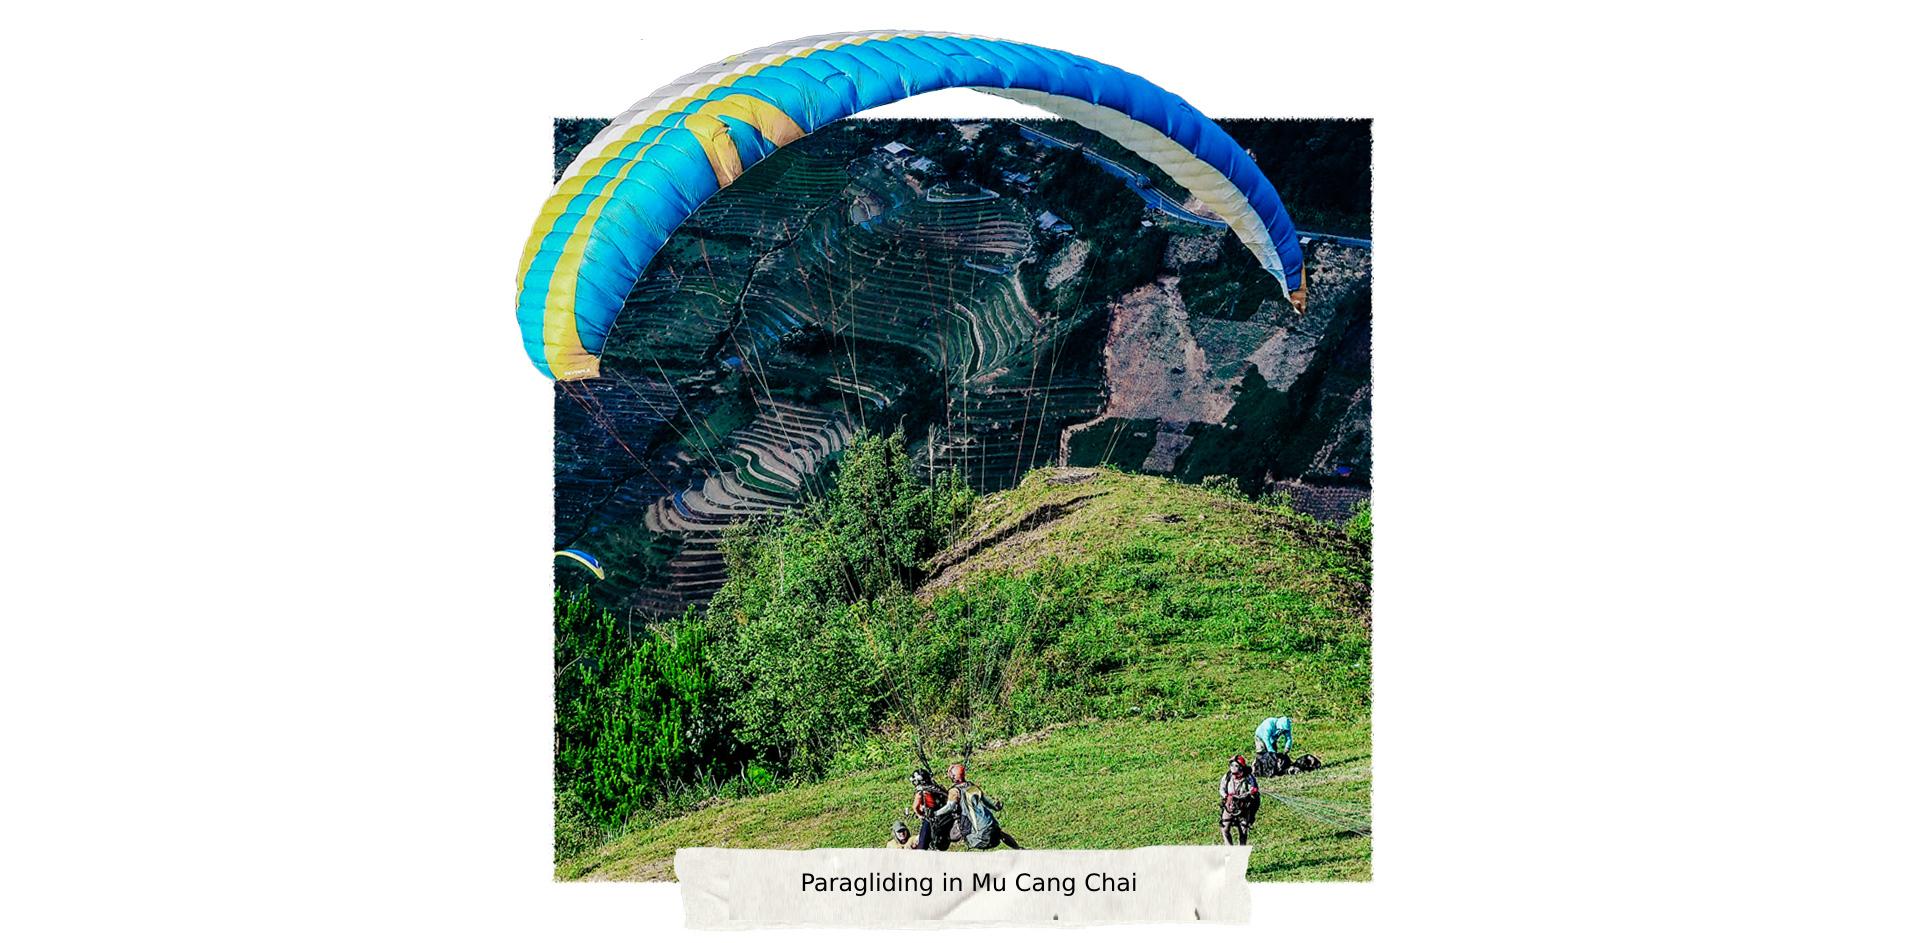 Tourists try paragliding in Mu Cang Chai District, Yen Bai Province, Vietnam. Photo: Nam Tran / Tuoi Tre